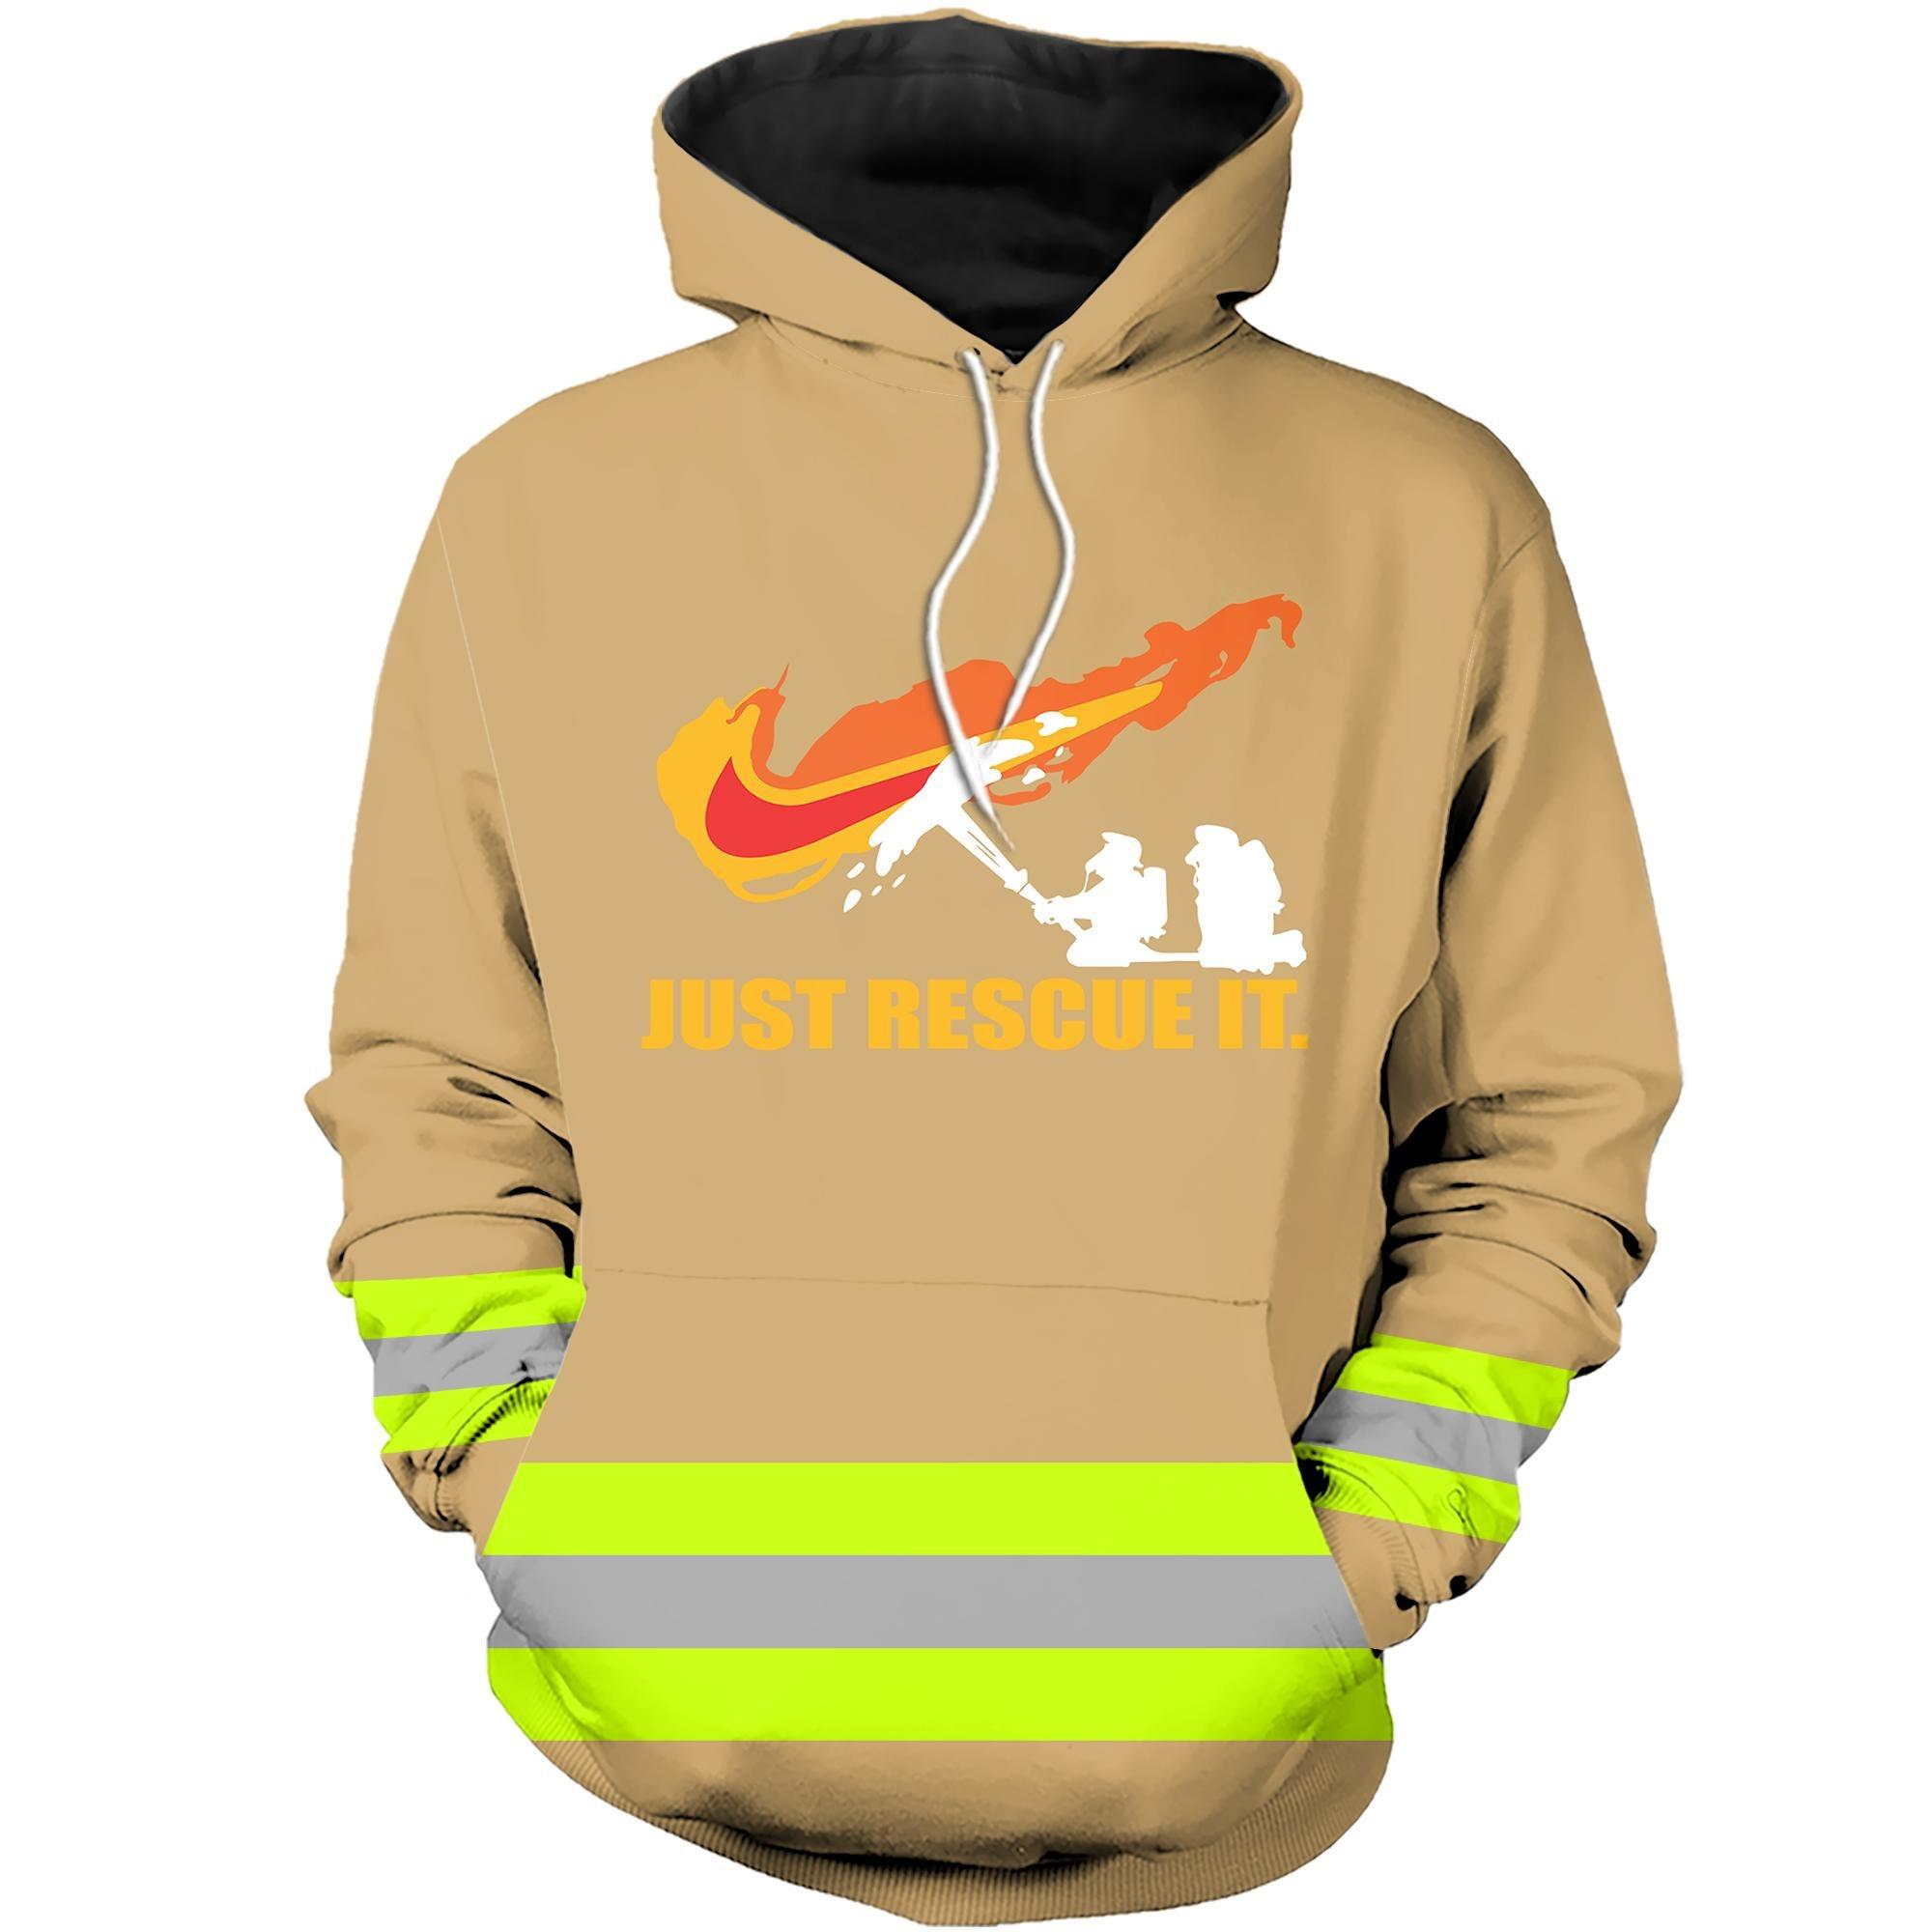 Under armour firefighter 3D hot hoodie